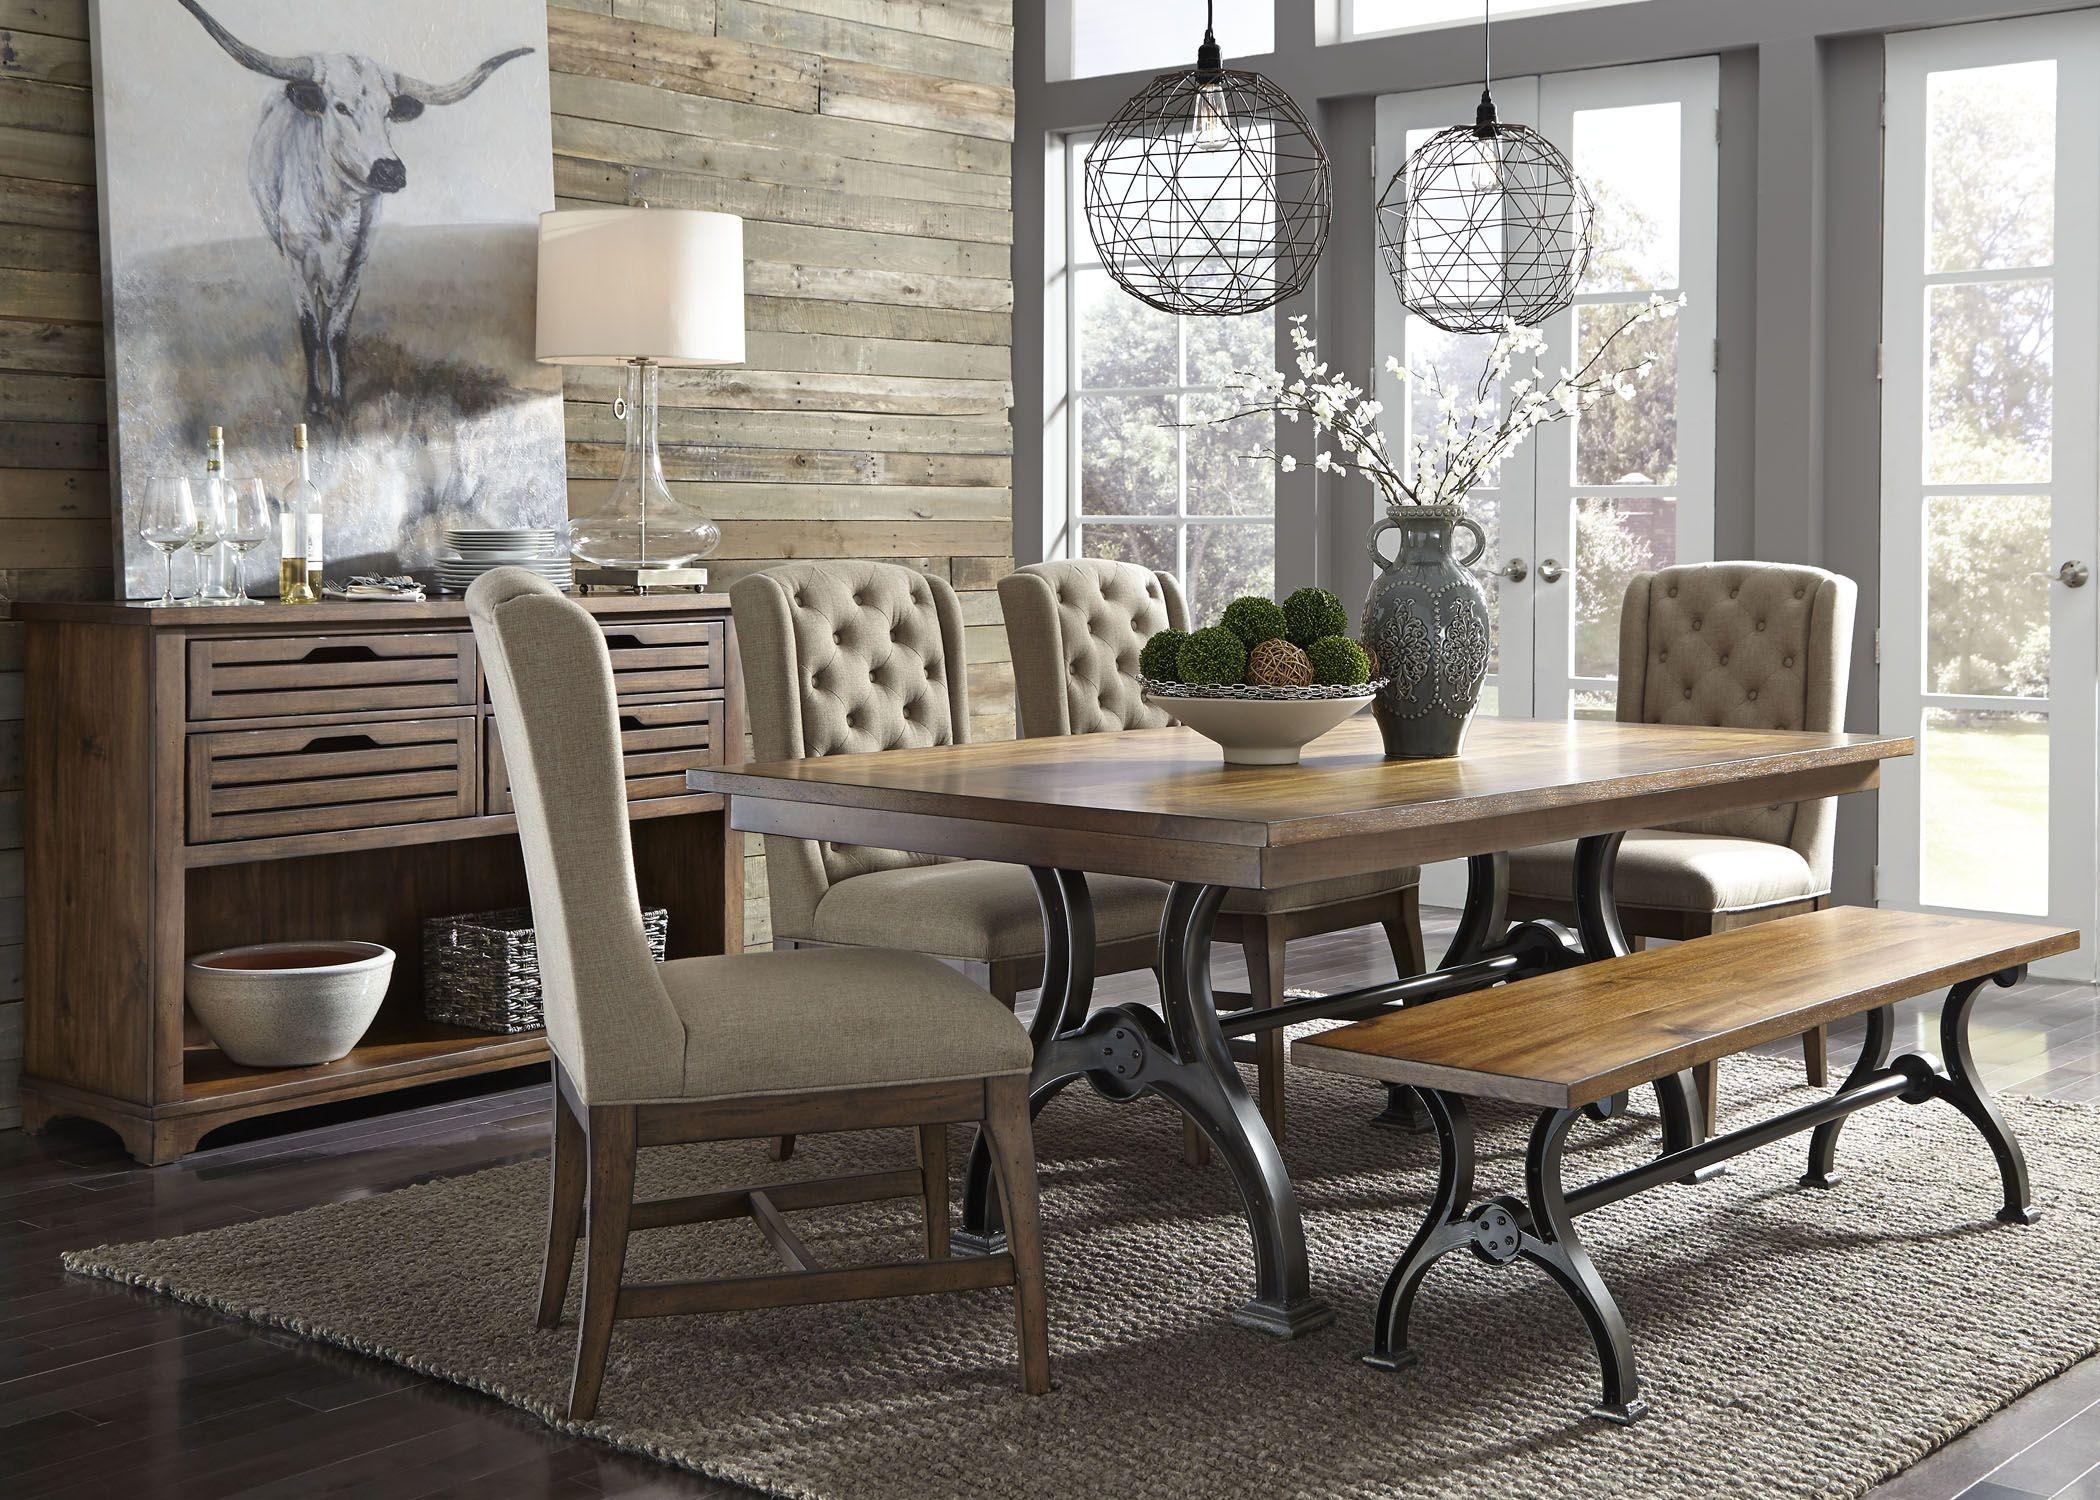 Arlington House Cobblestone Brown Trestle Dining Room Set  : 411 dr 6trs2 from colemanfurniture.com size 2100 x 1500 jpeg 823kB